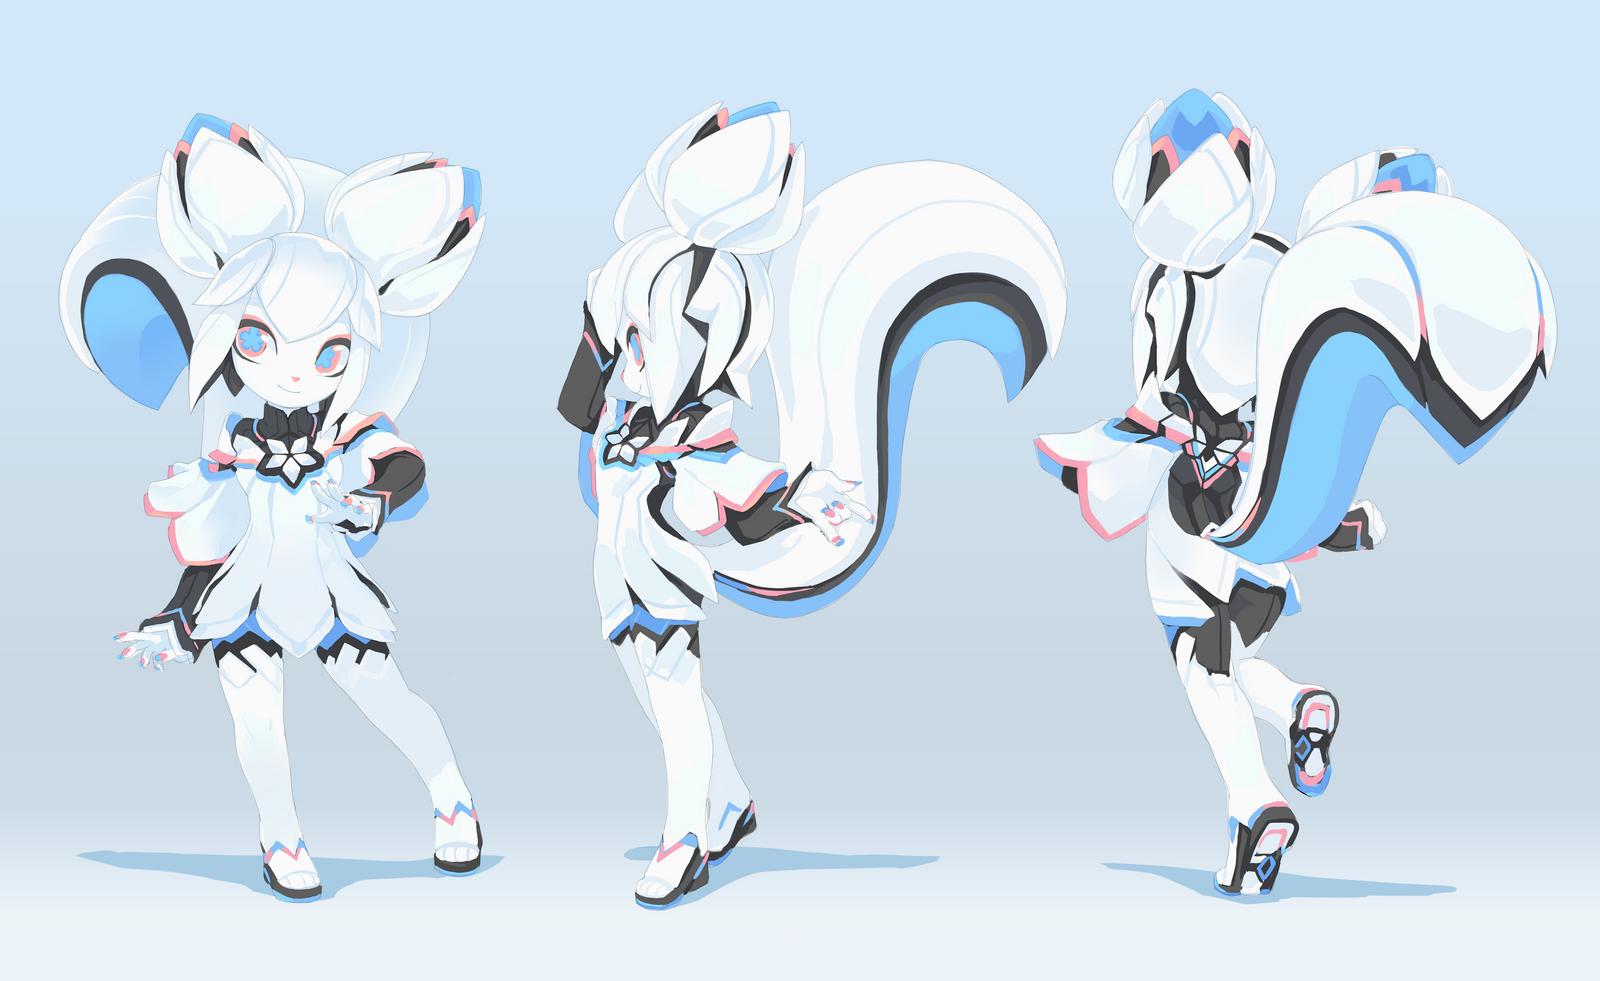 Character Design Krita : Kiki s plastic model kit design sheet by tysontan on